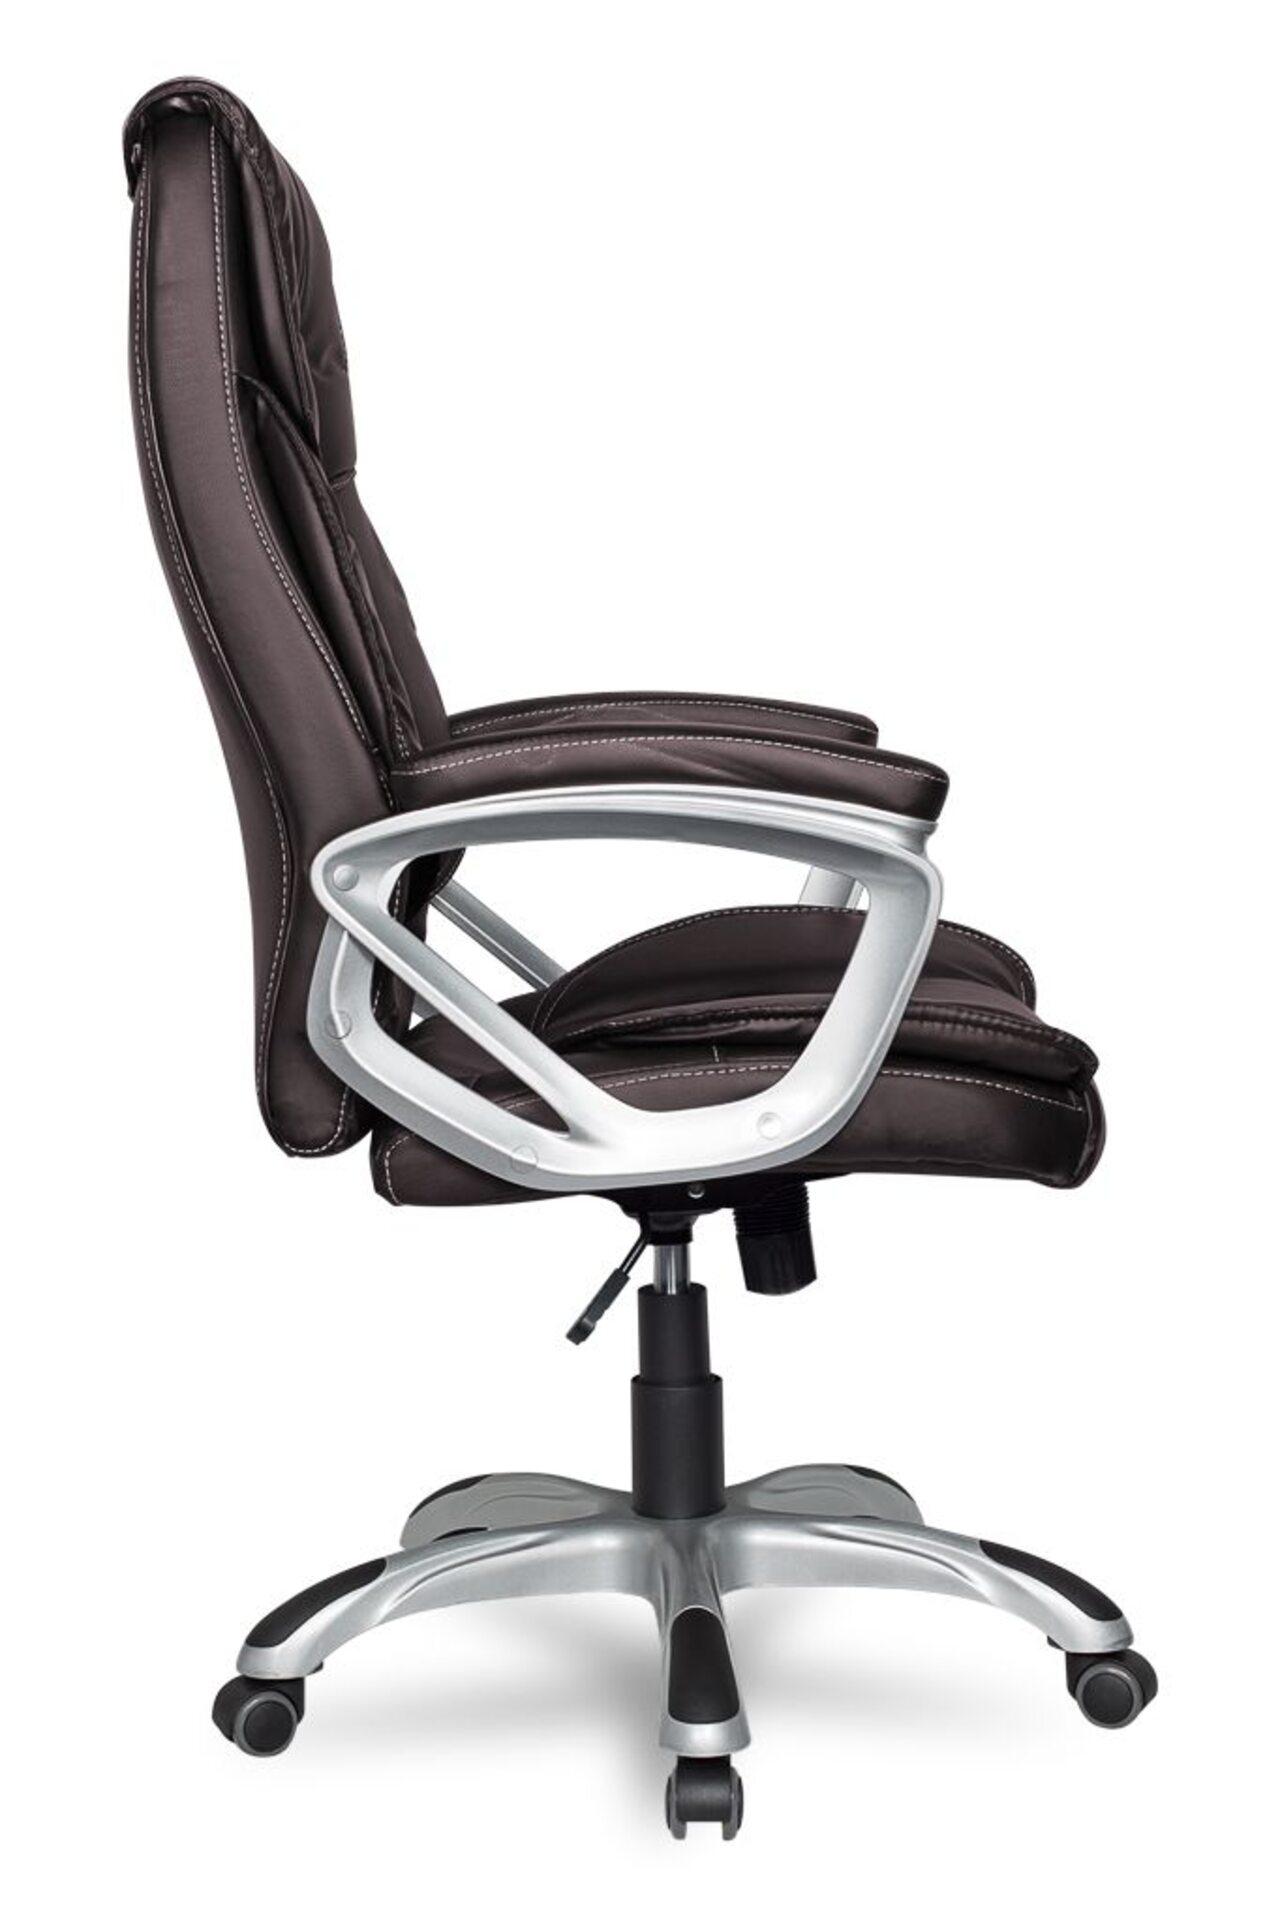 Кресло руководителя College CLG-615 LXH - фото 9